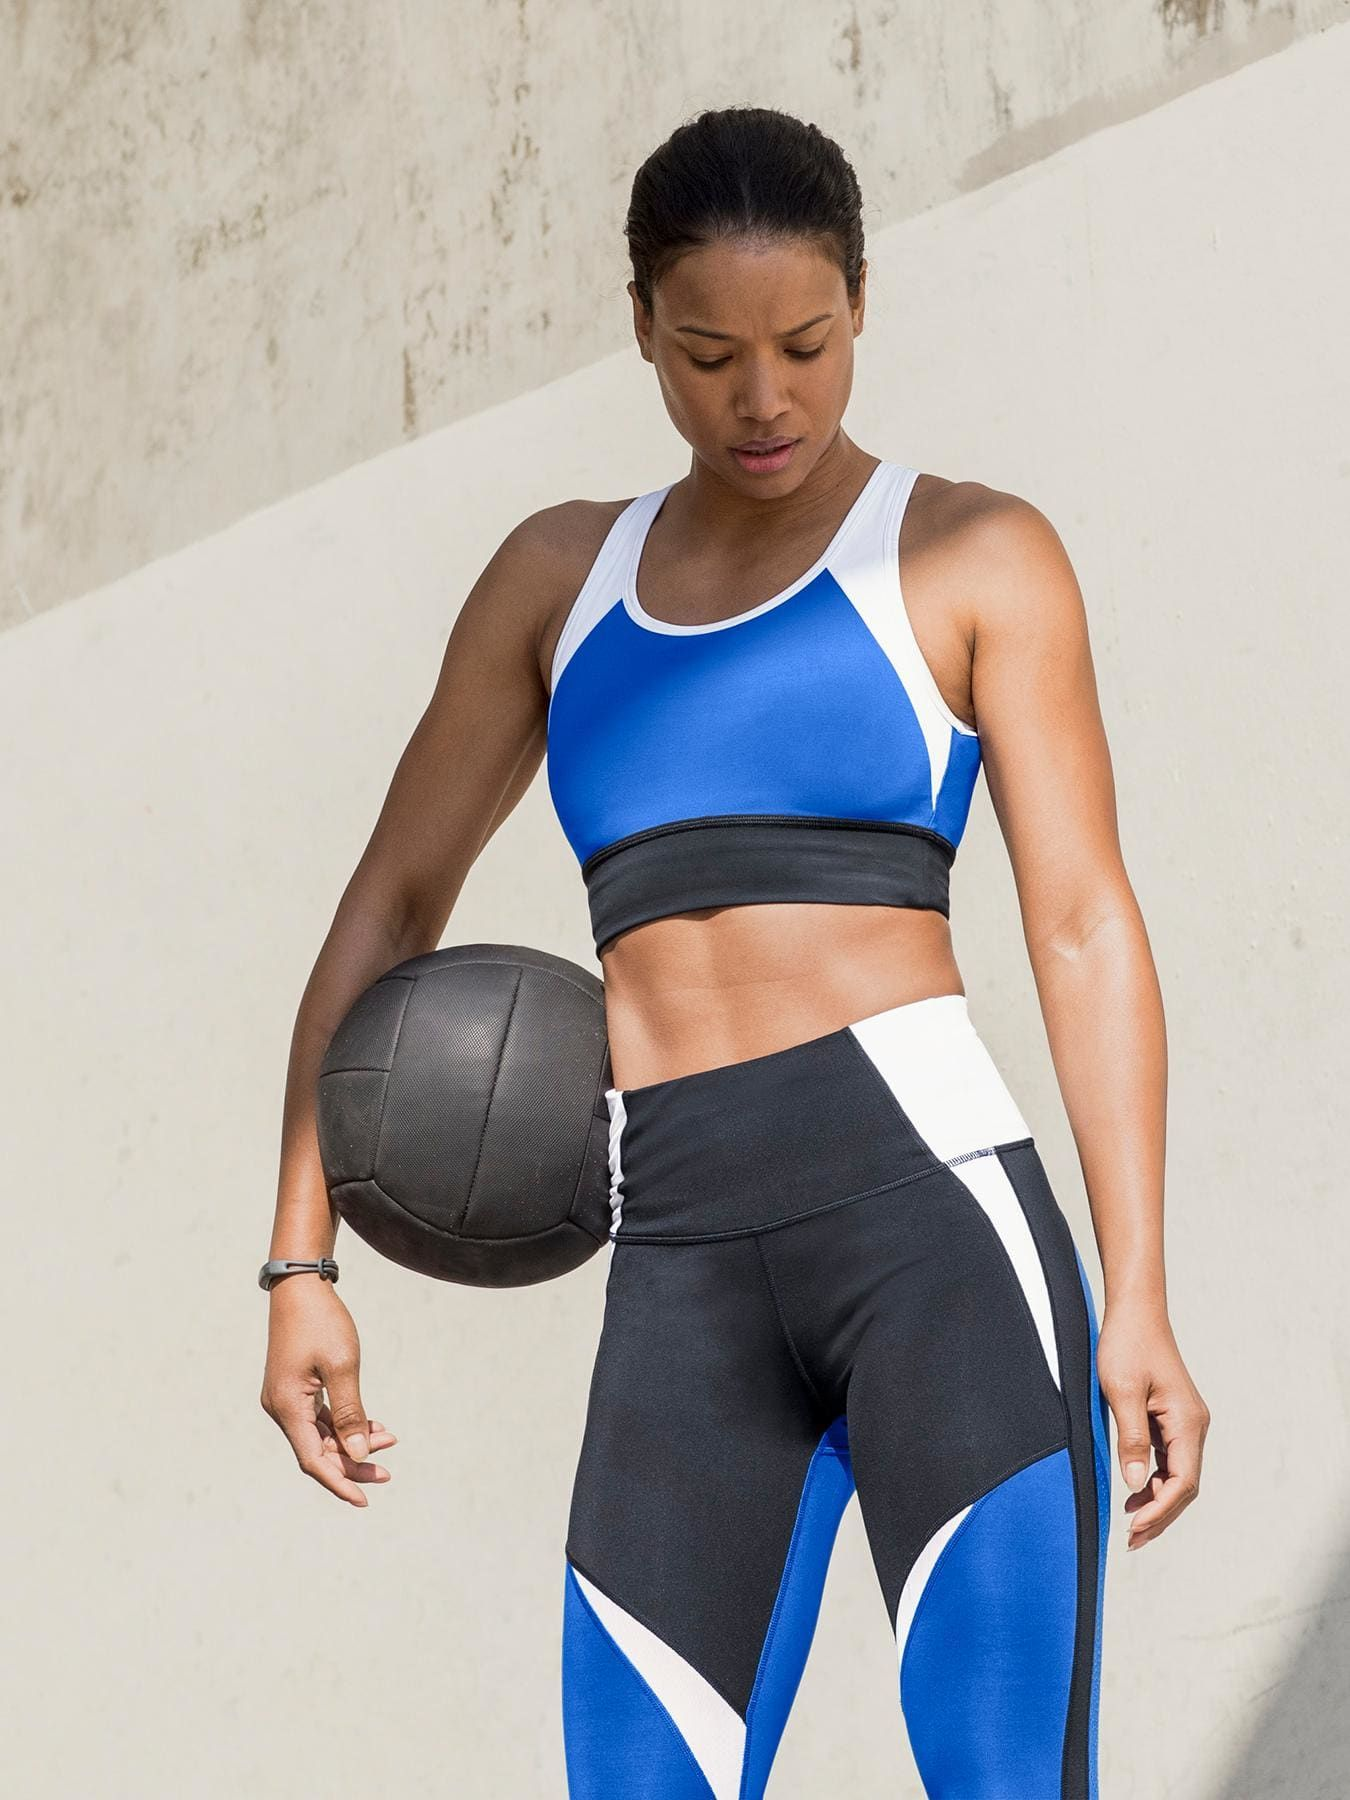 Pin by Debra Denham on Fitness Apparel Fitness fashion